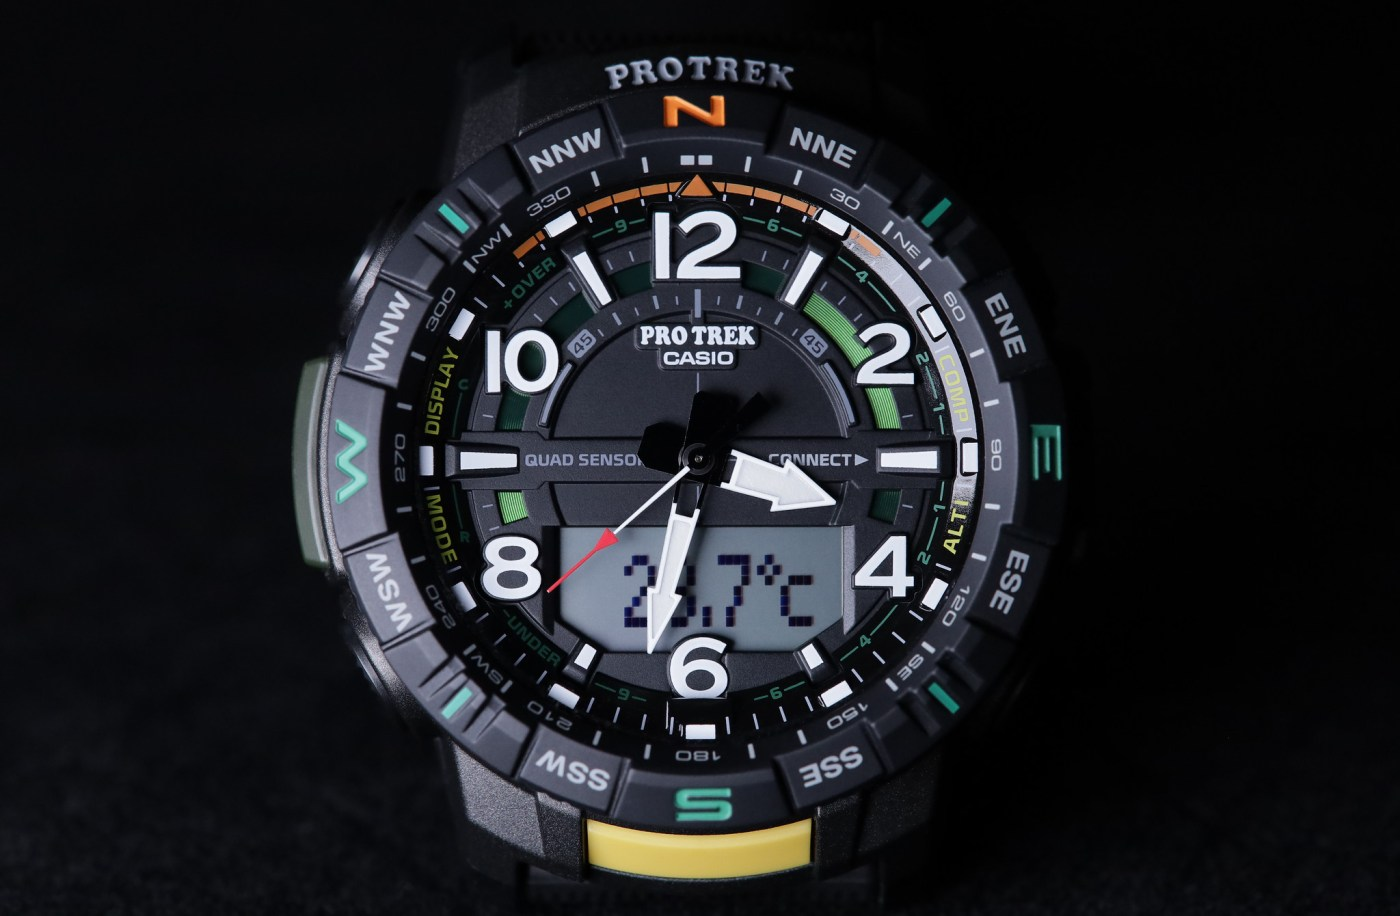 Casio Pro Trek PRT-B50 dial detail